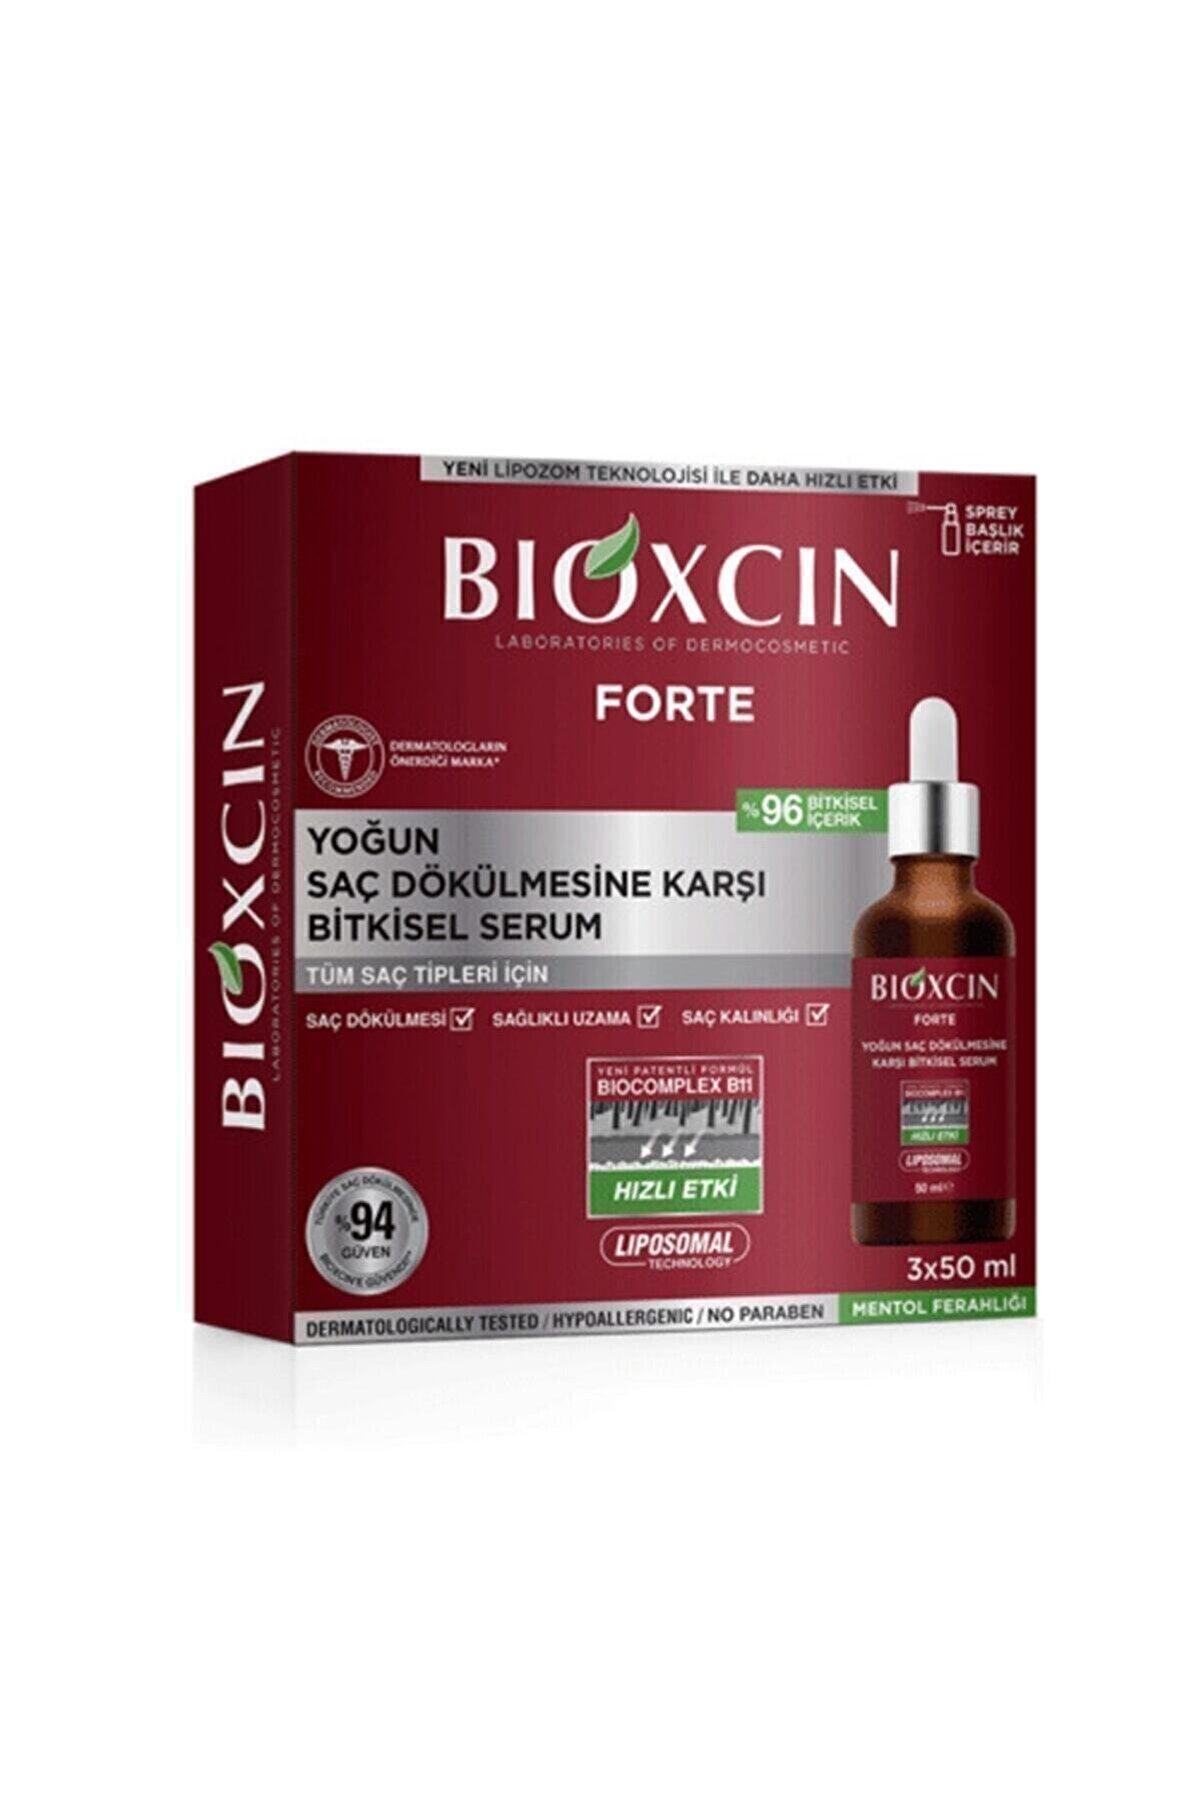 Bioxcin Forte Serum 3 x 50 ml